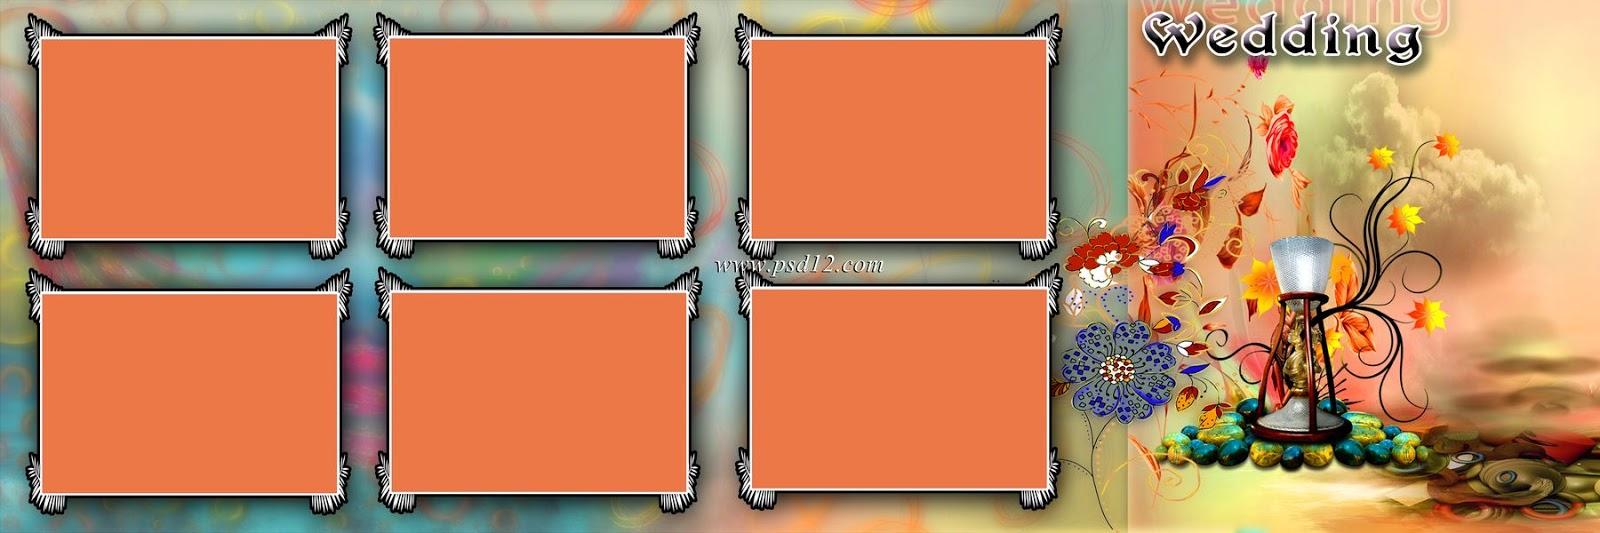 Wedding Album Design 12x36 Psd Files 11